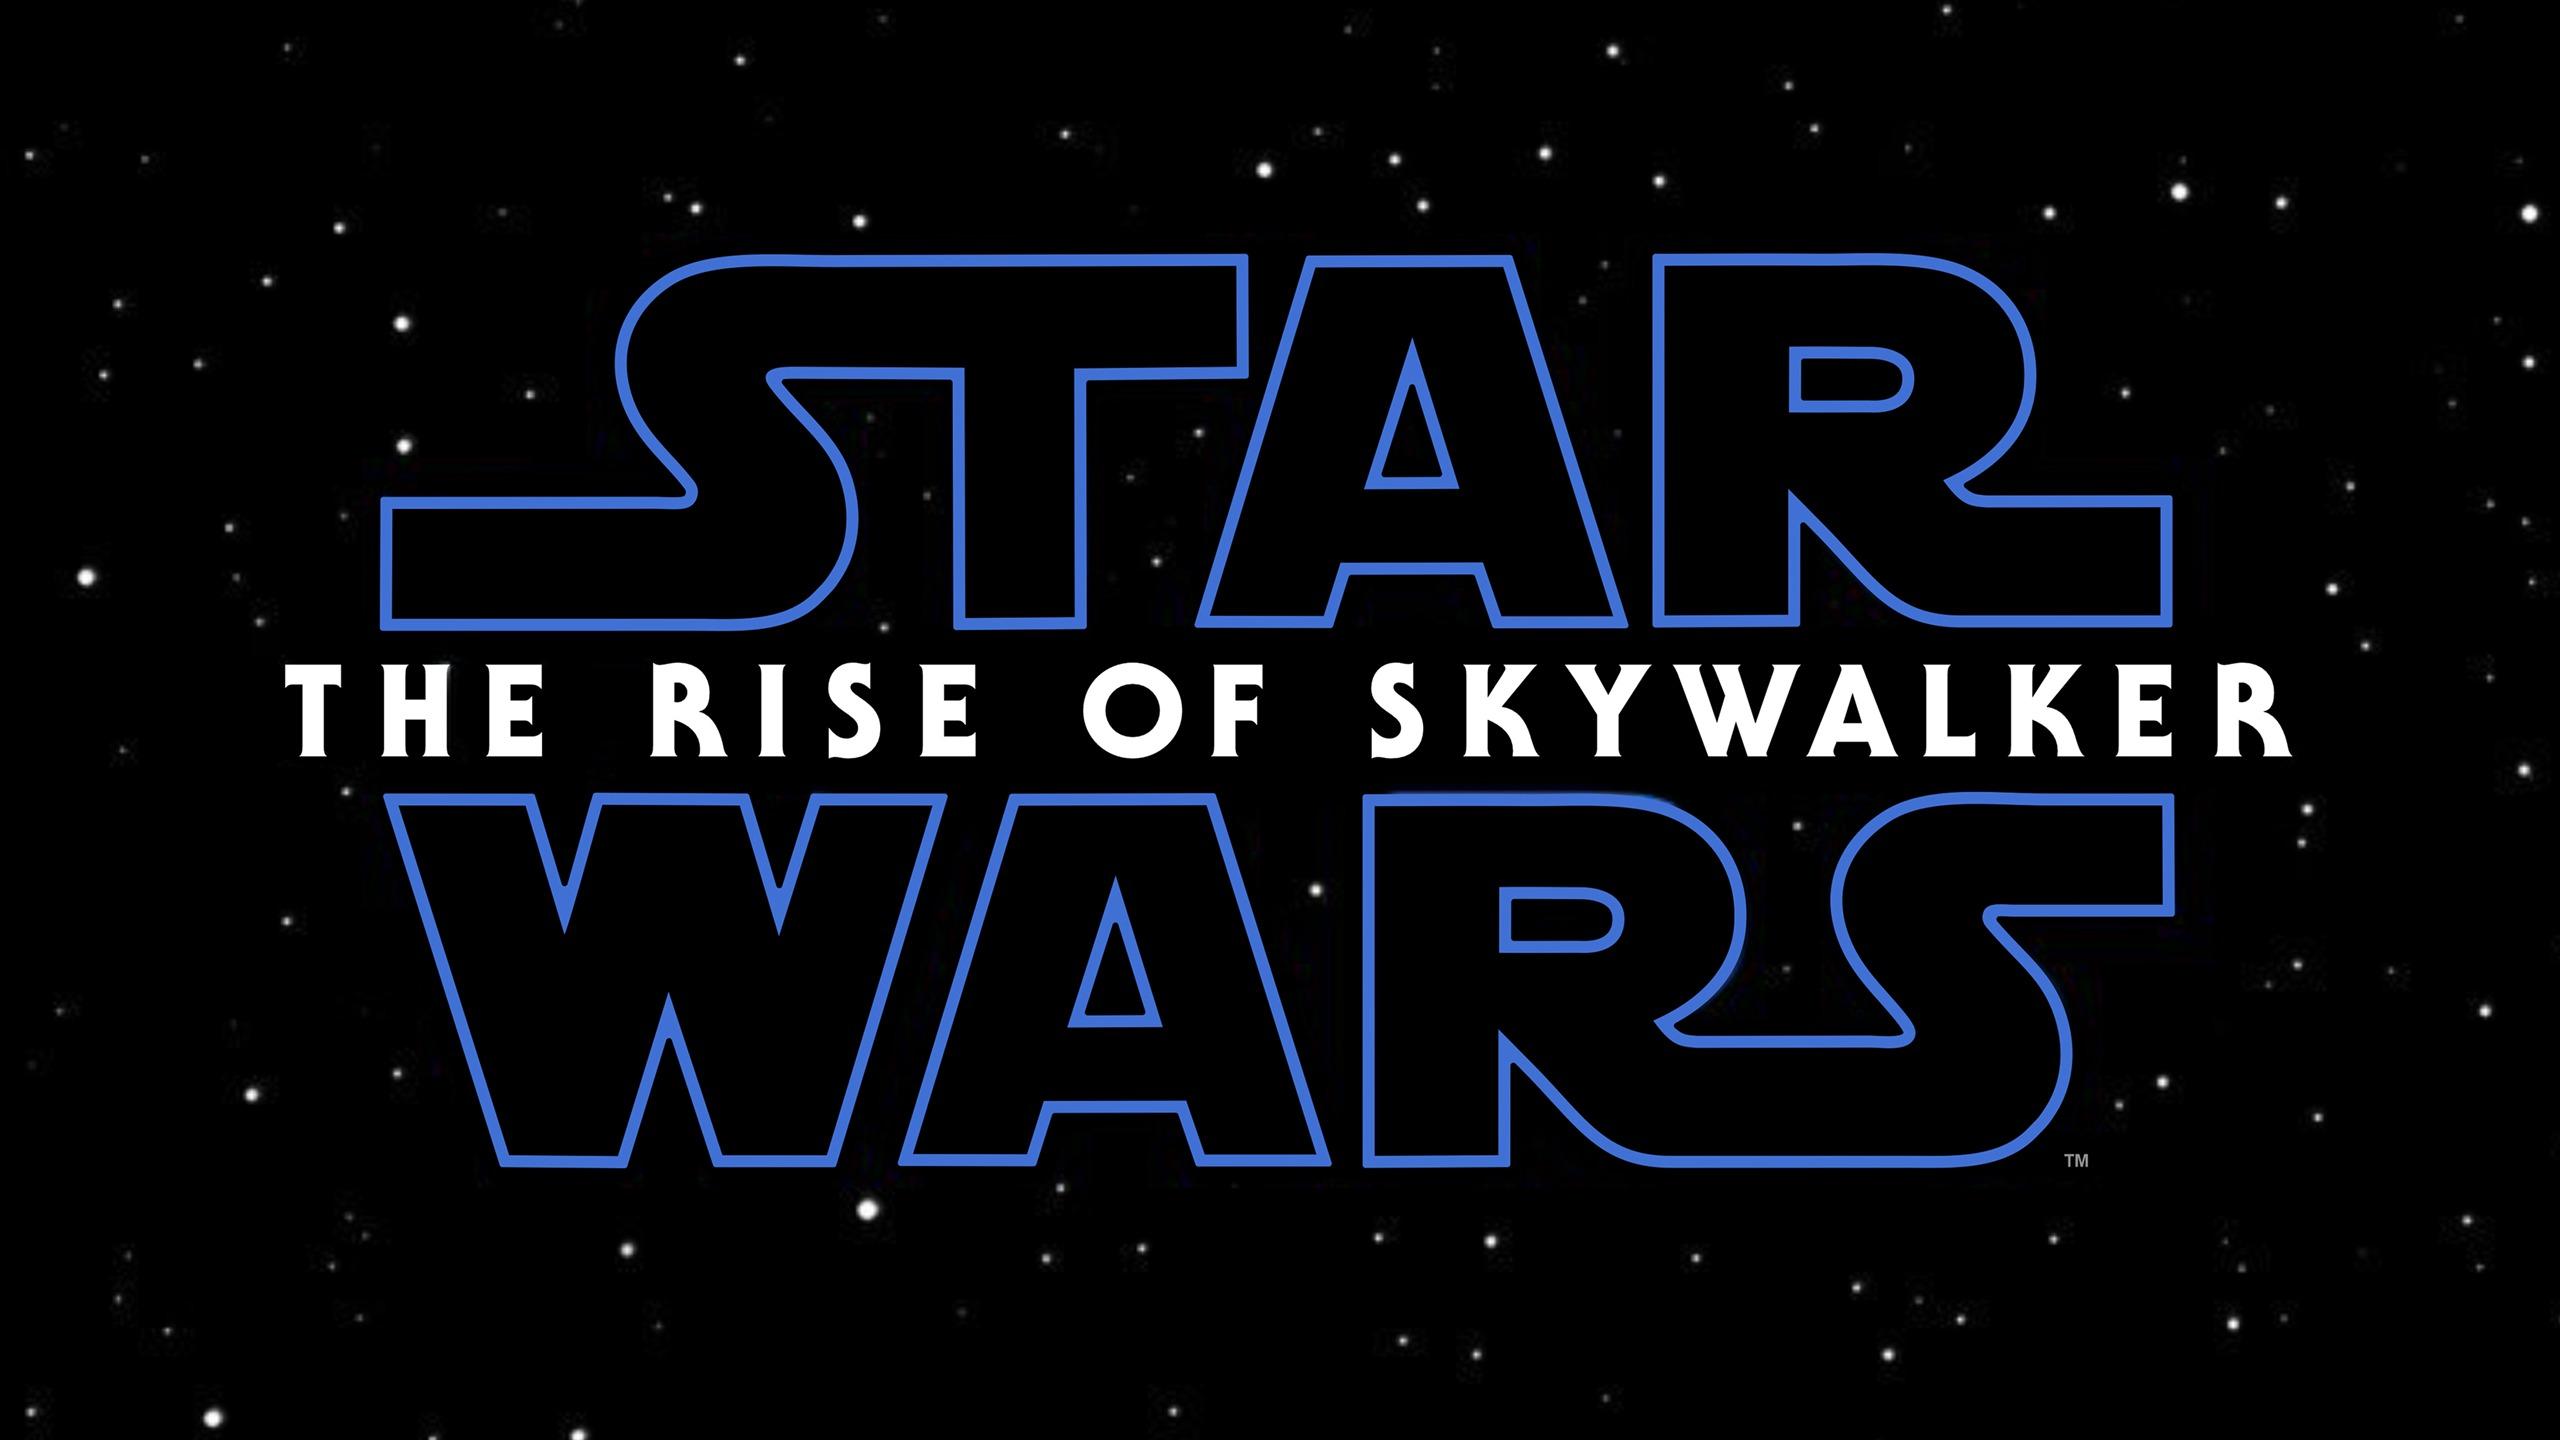 2019 Star Wars The Rise Of Skywalker 4k Hd Poster Preview 10wallpaper Com